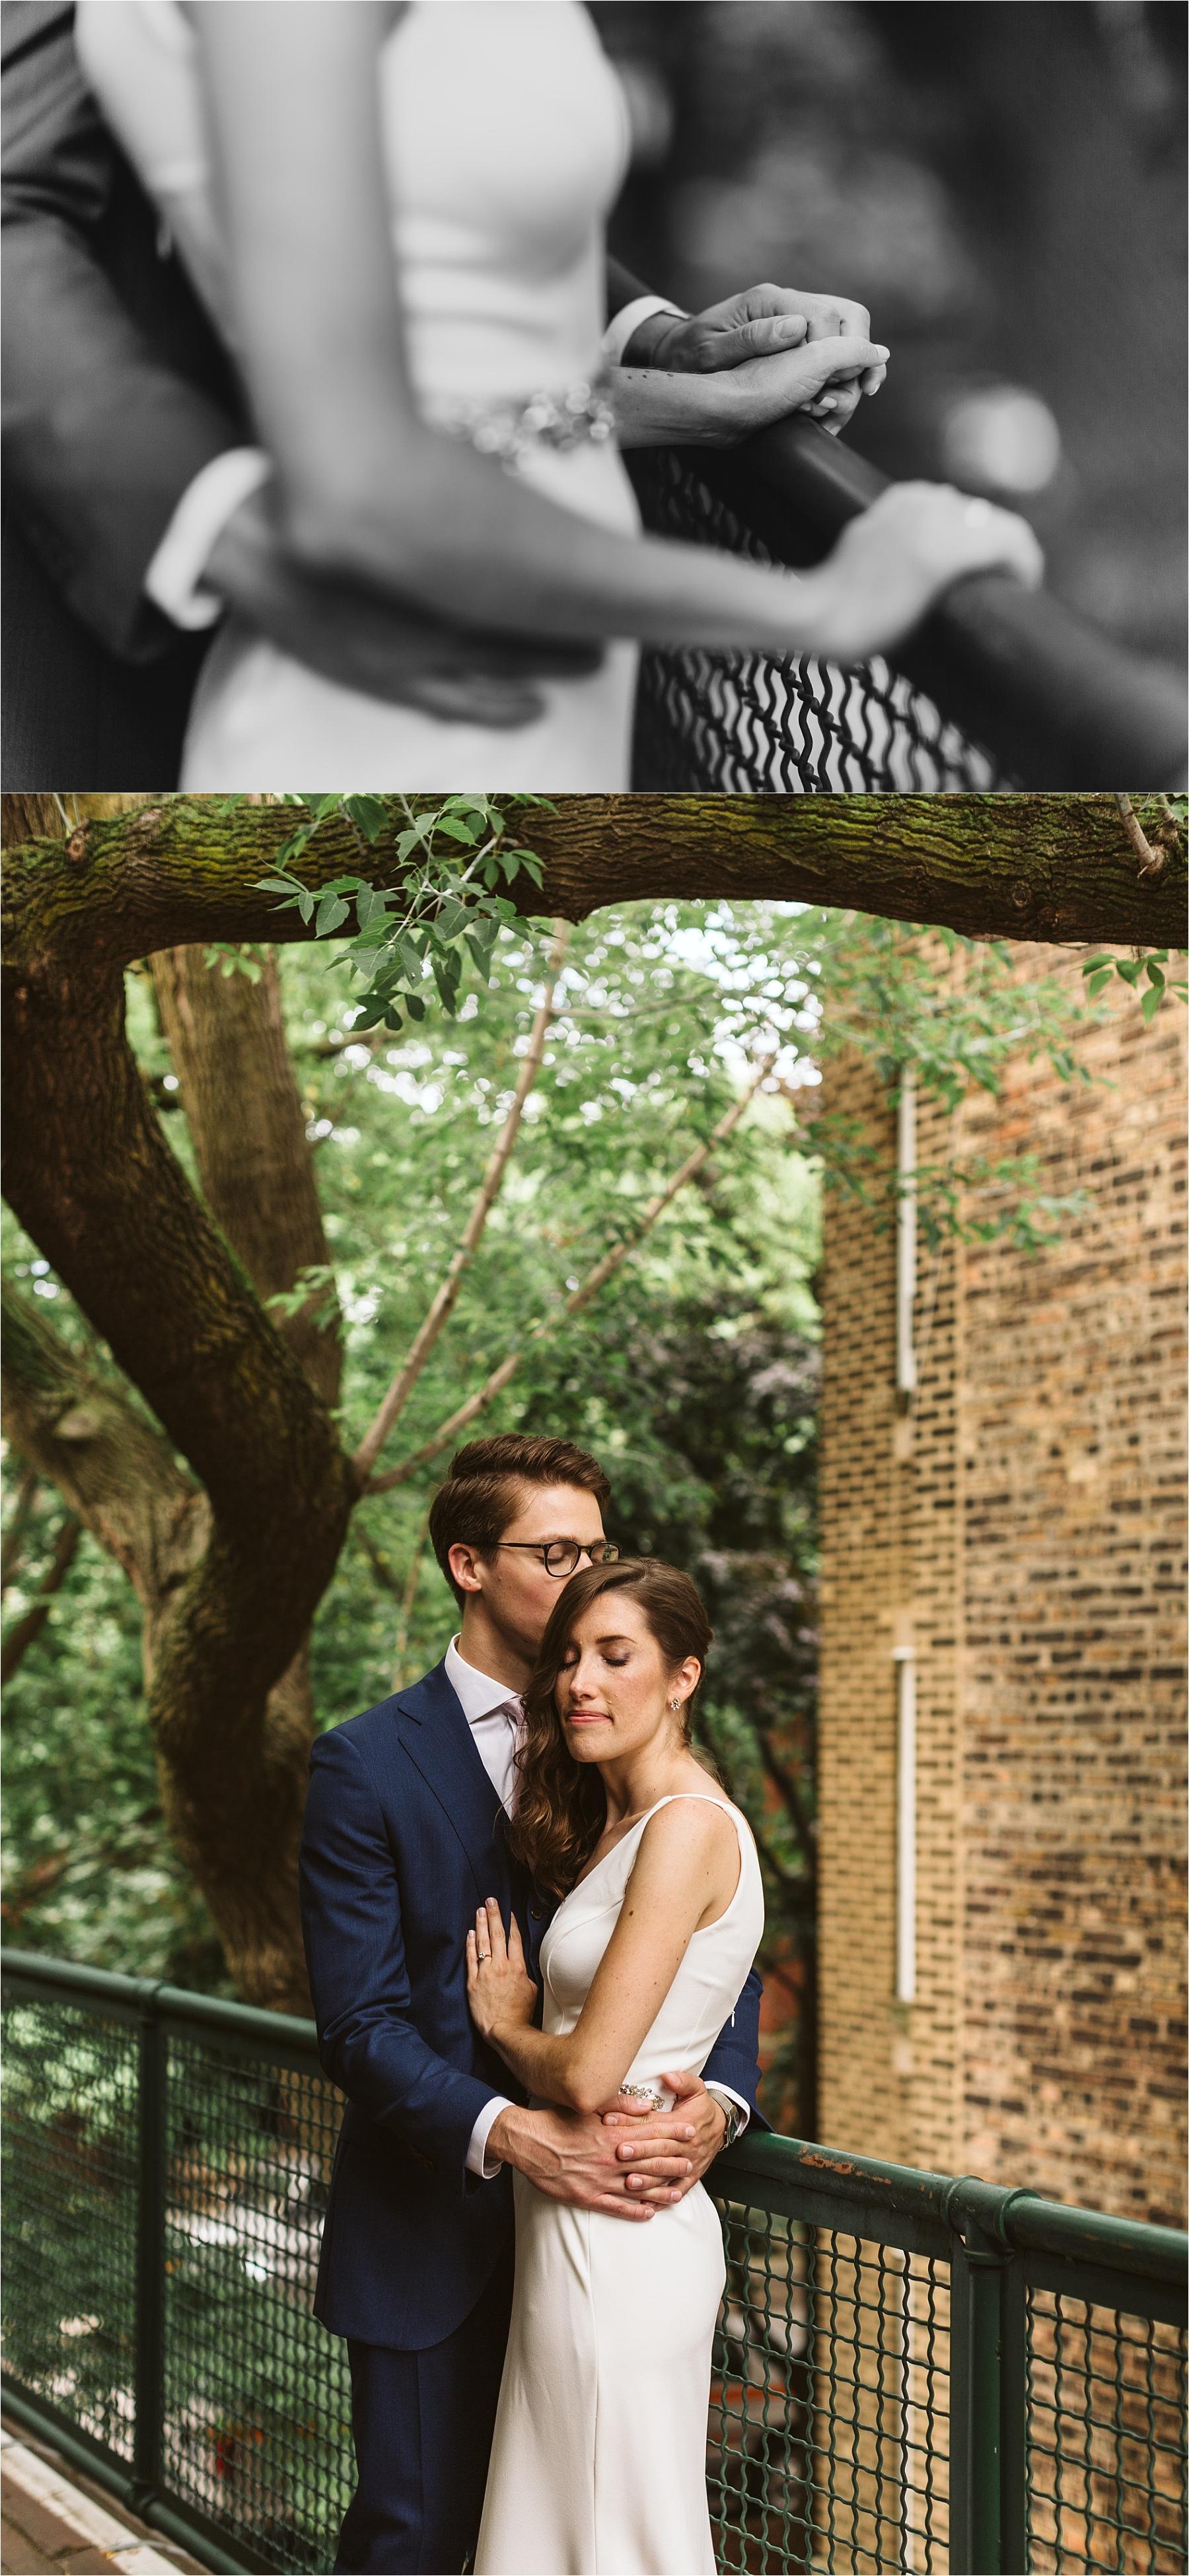 Intimate Firehouse Chicago Wedding_0022.jpg